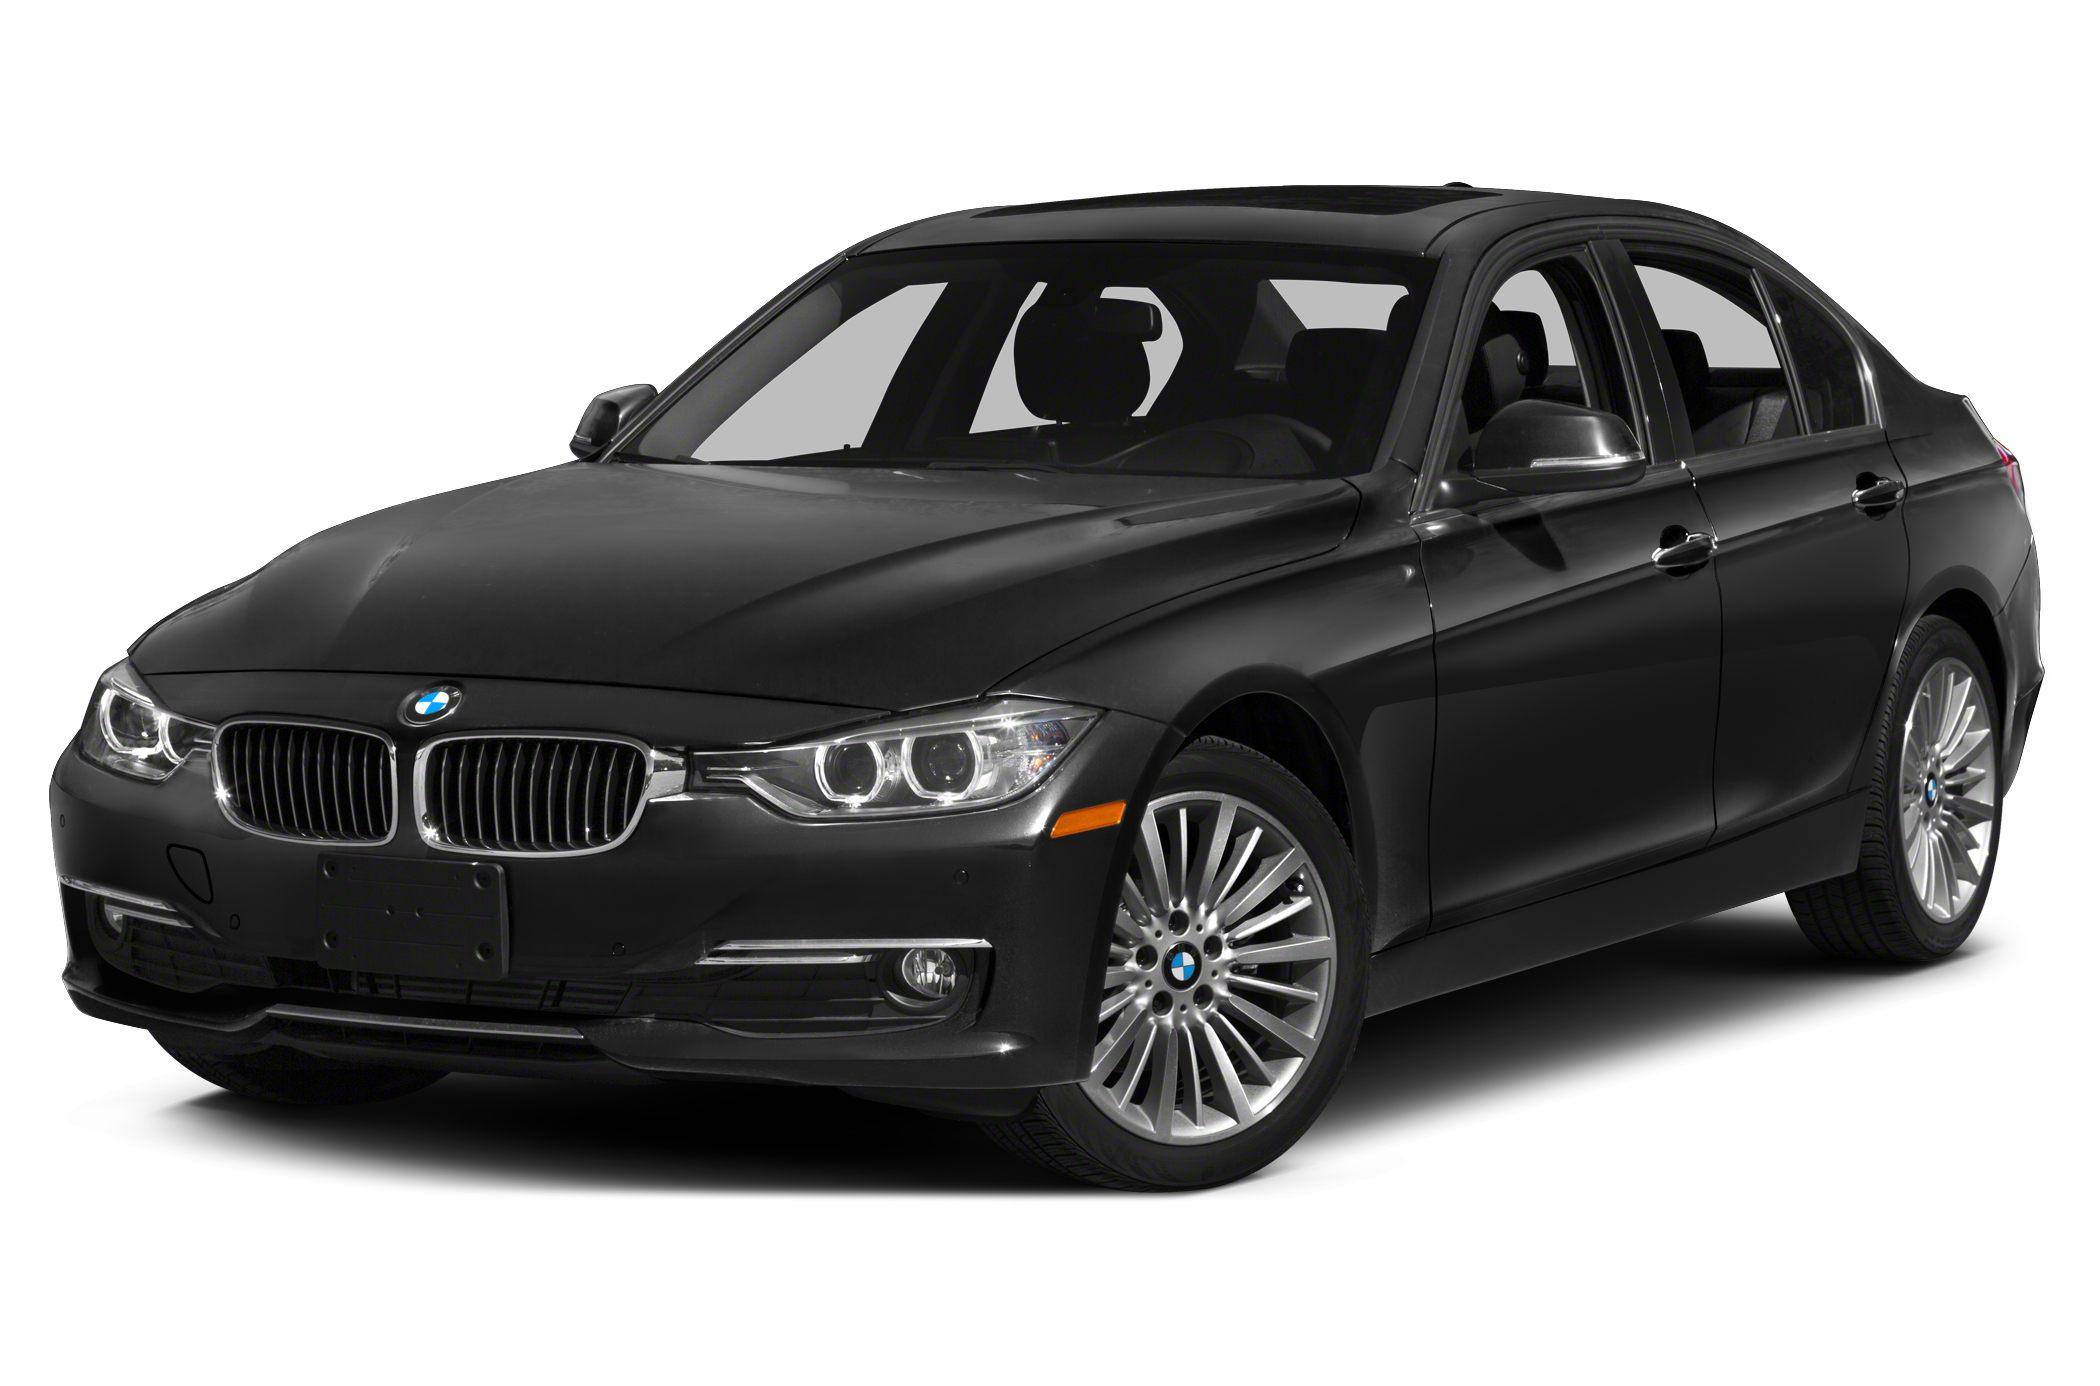 2015 BMW 328d Information